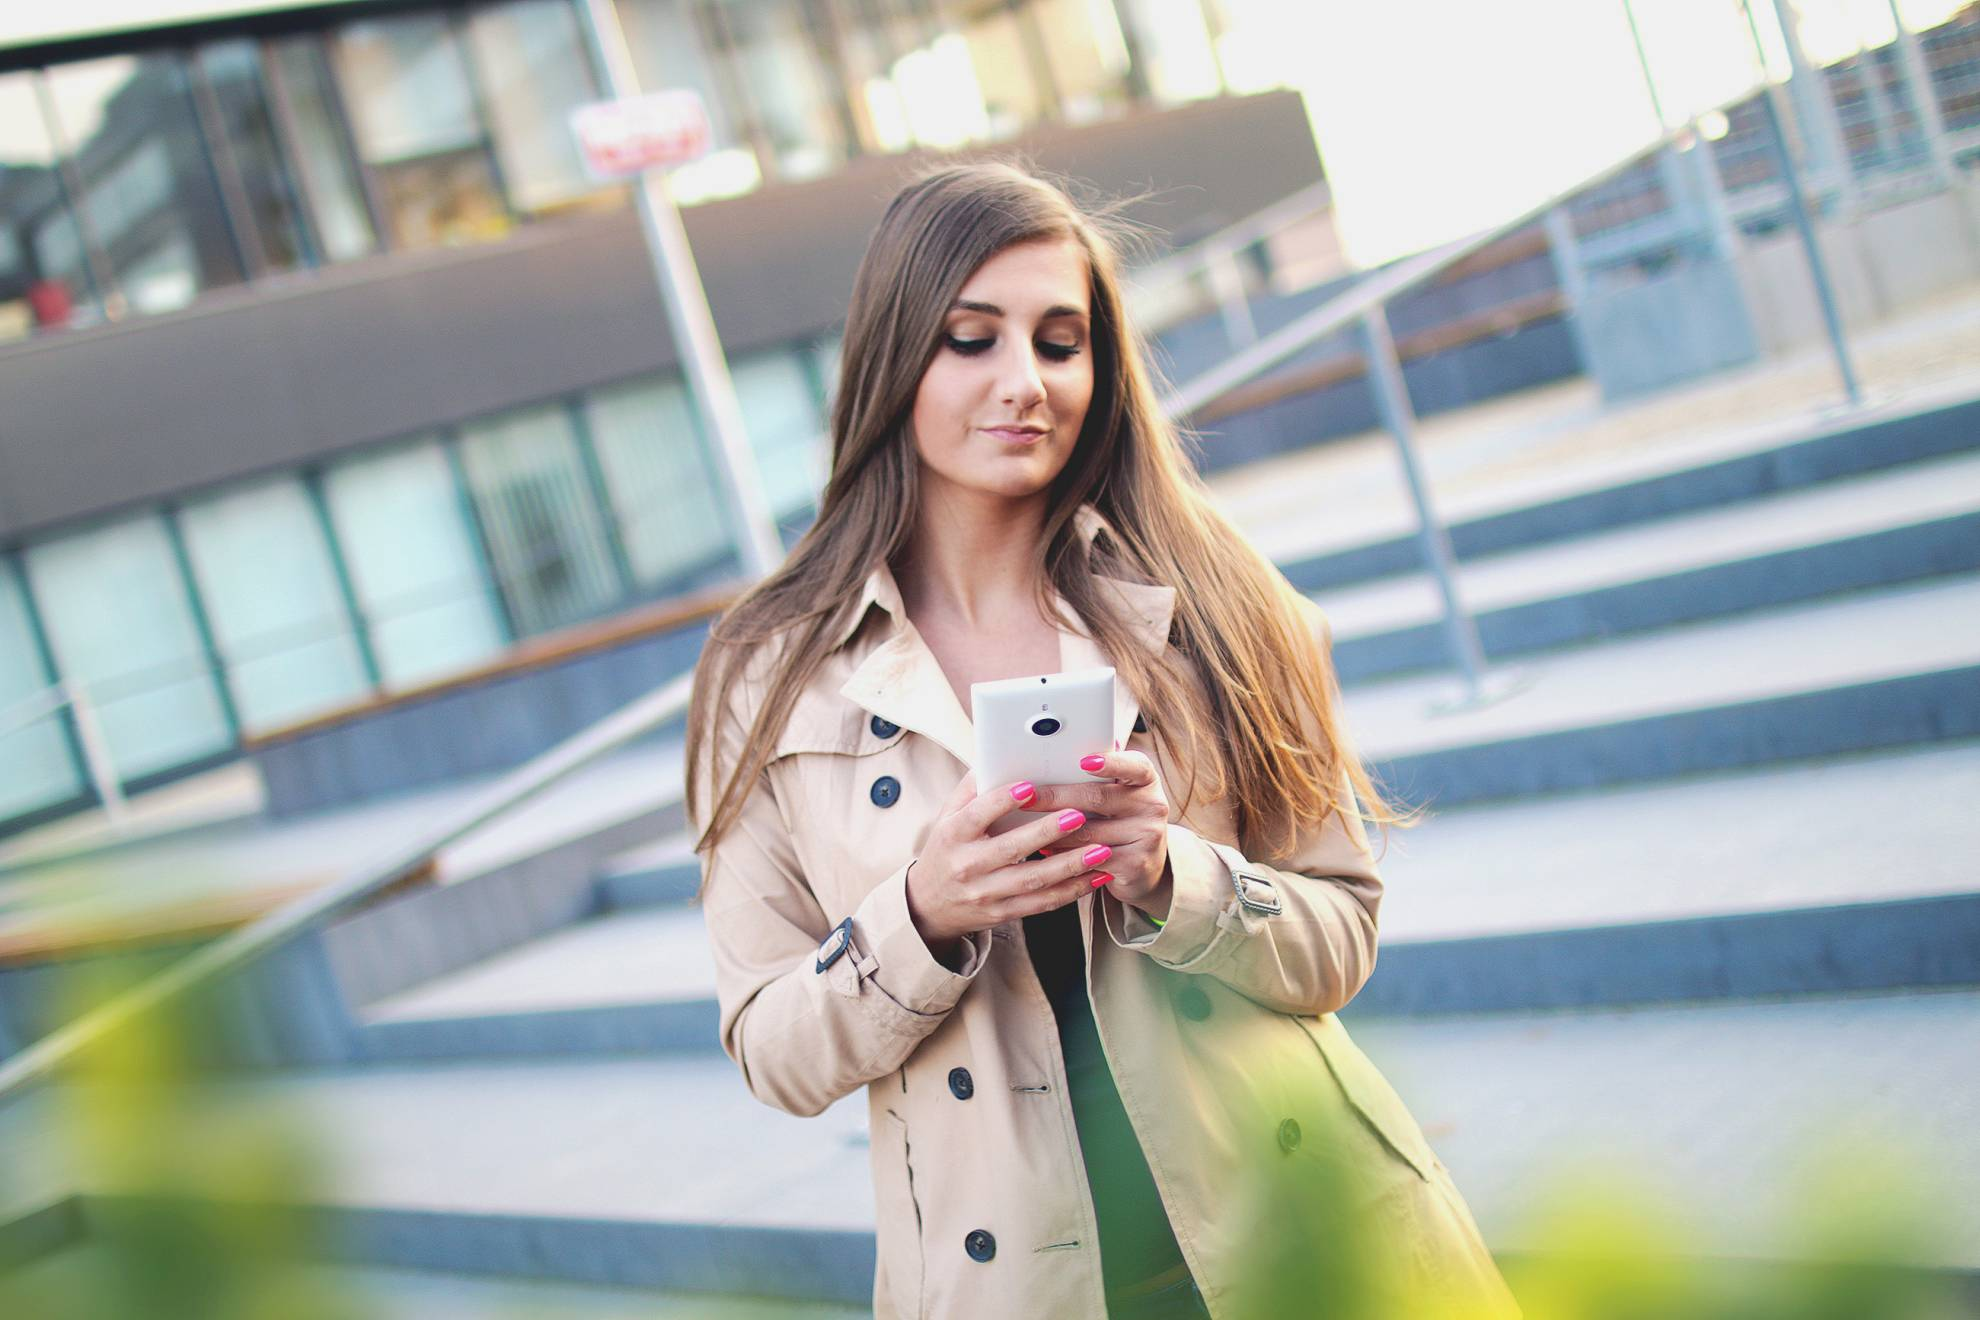 Smartfon dla kobiety